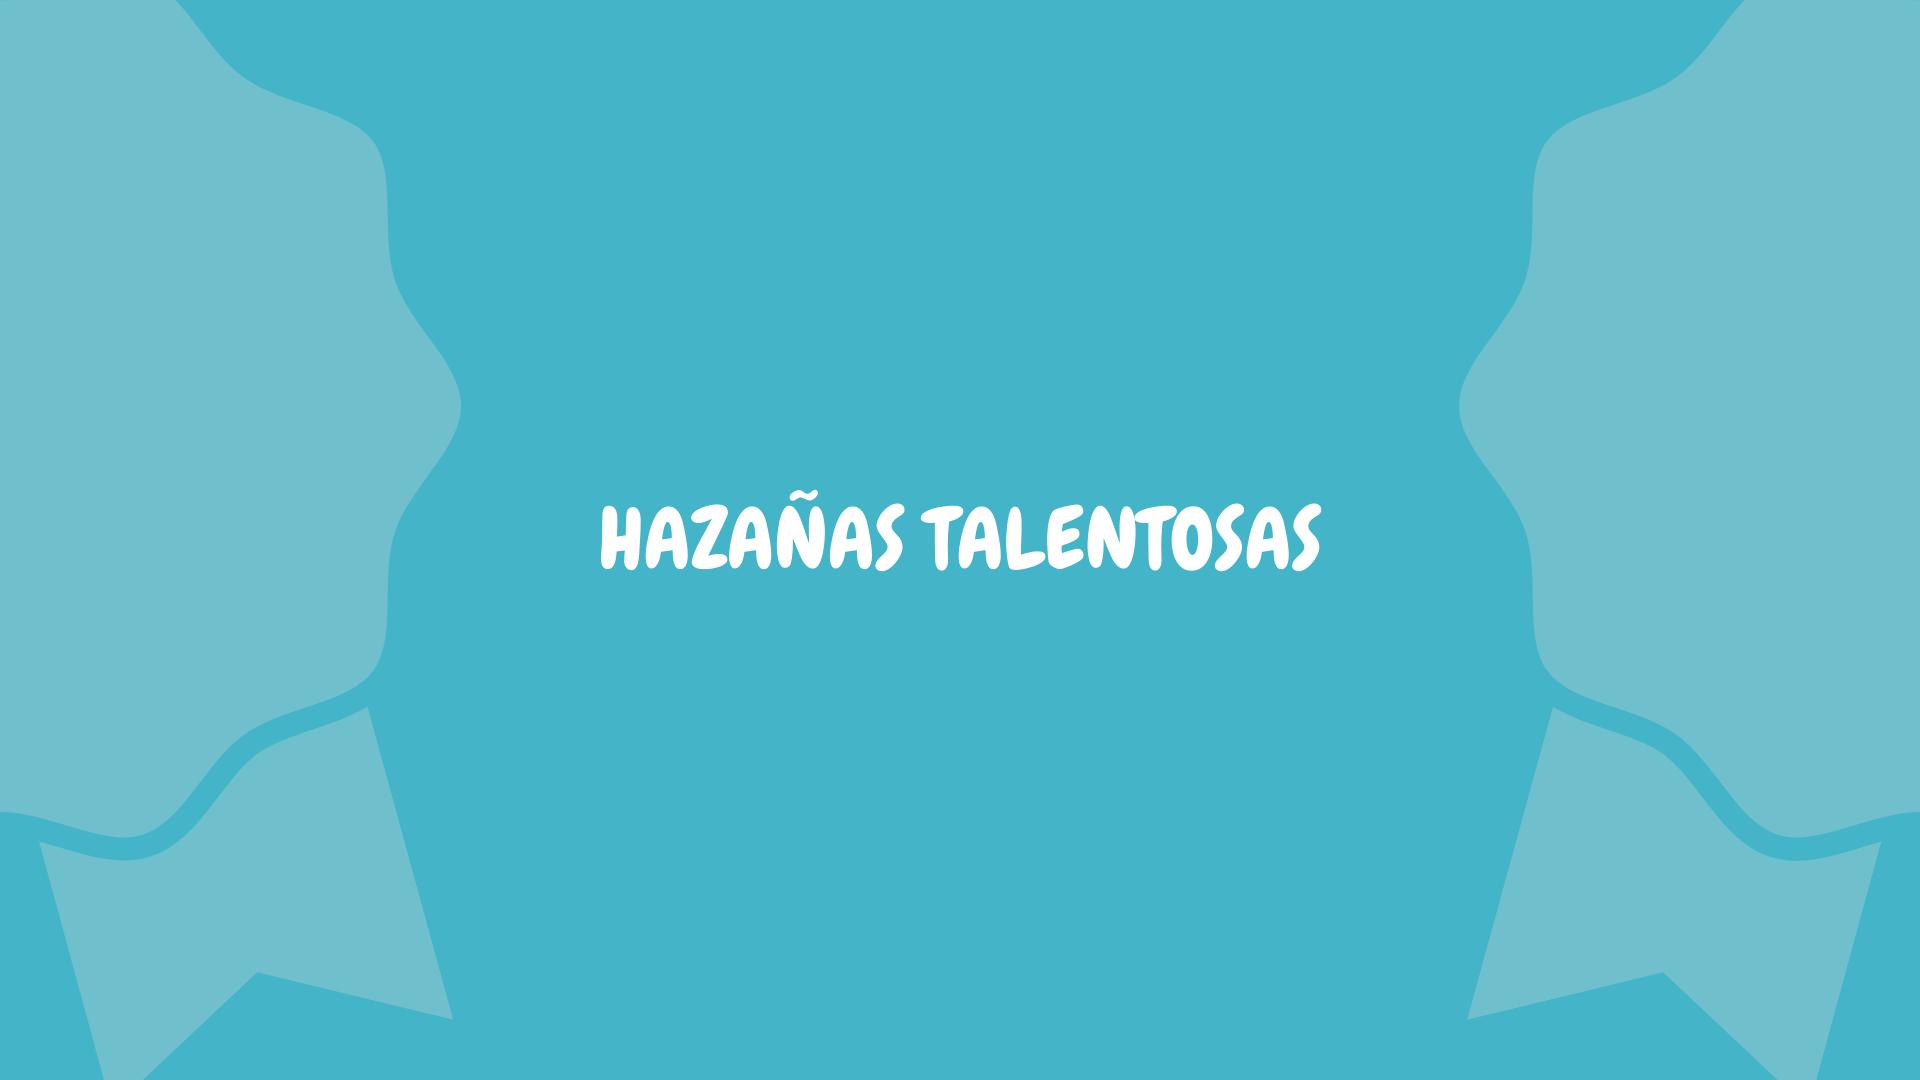 Boletín informativo Hazañas Talentosas 3